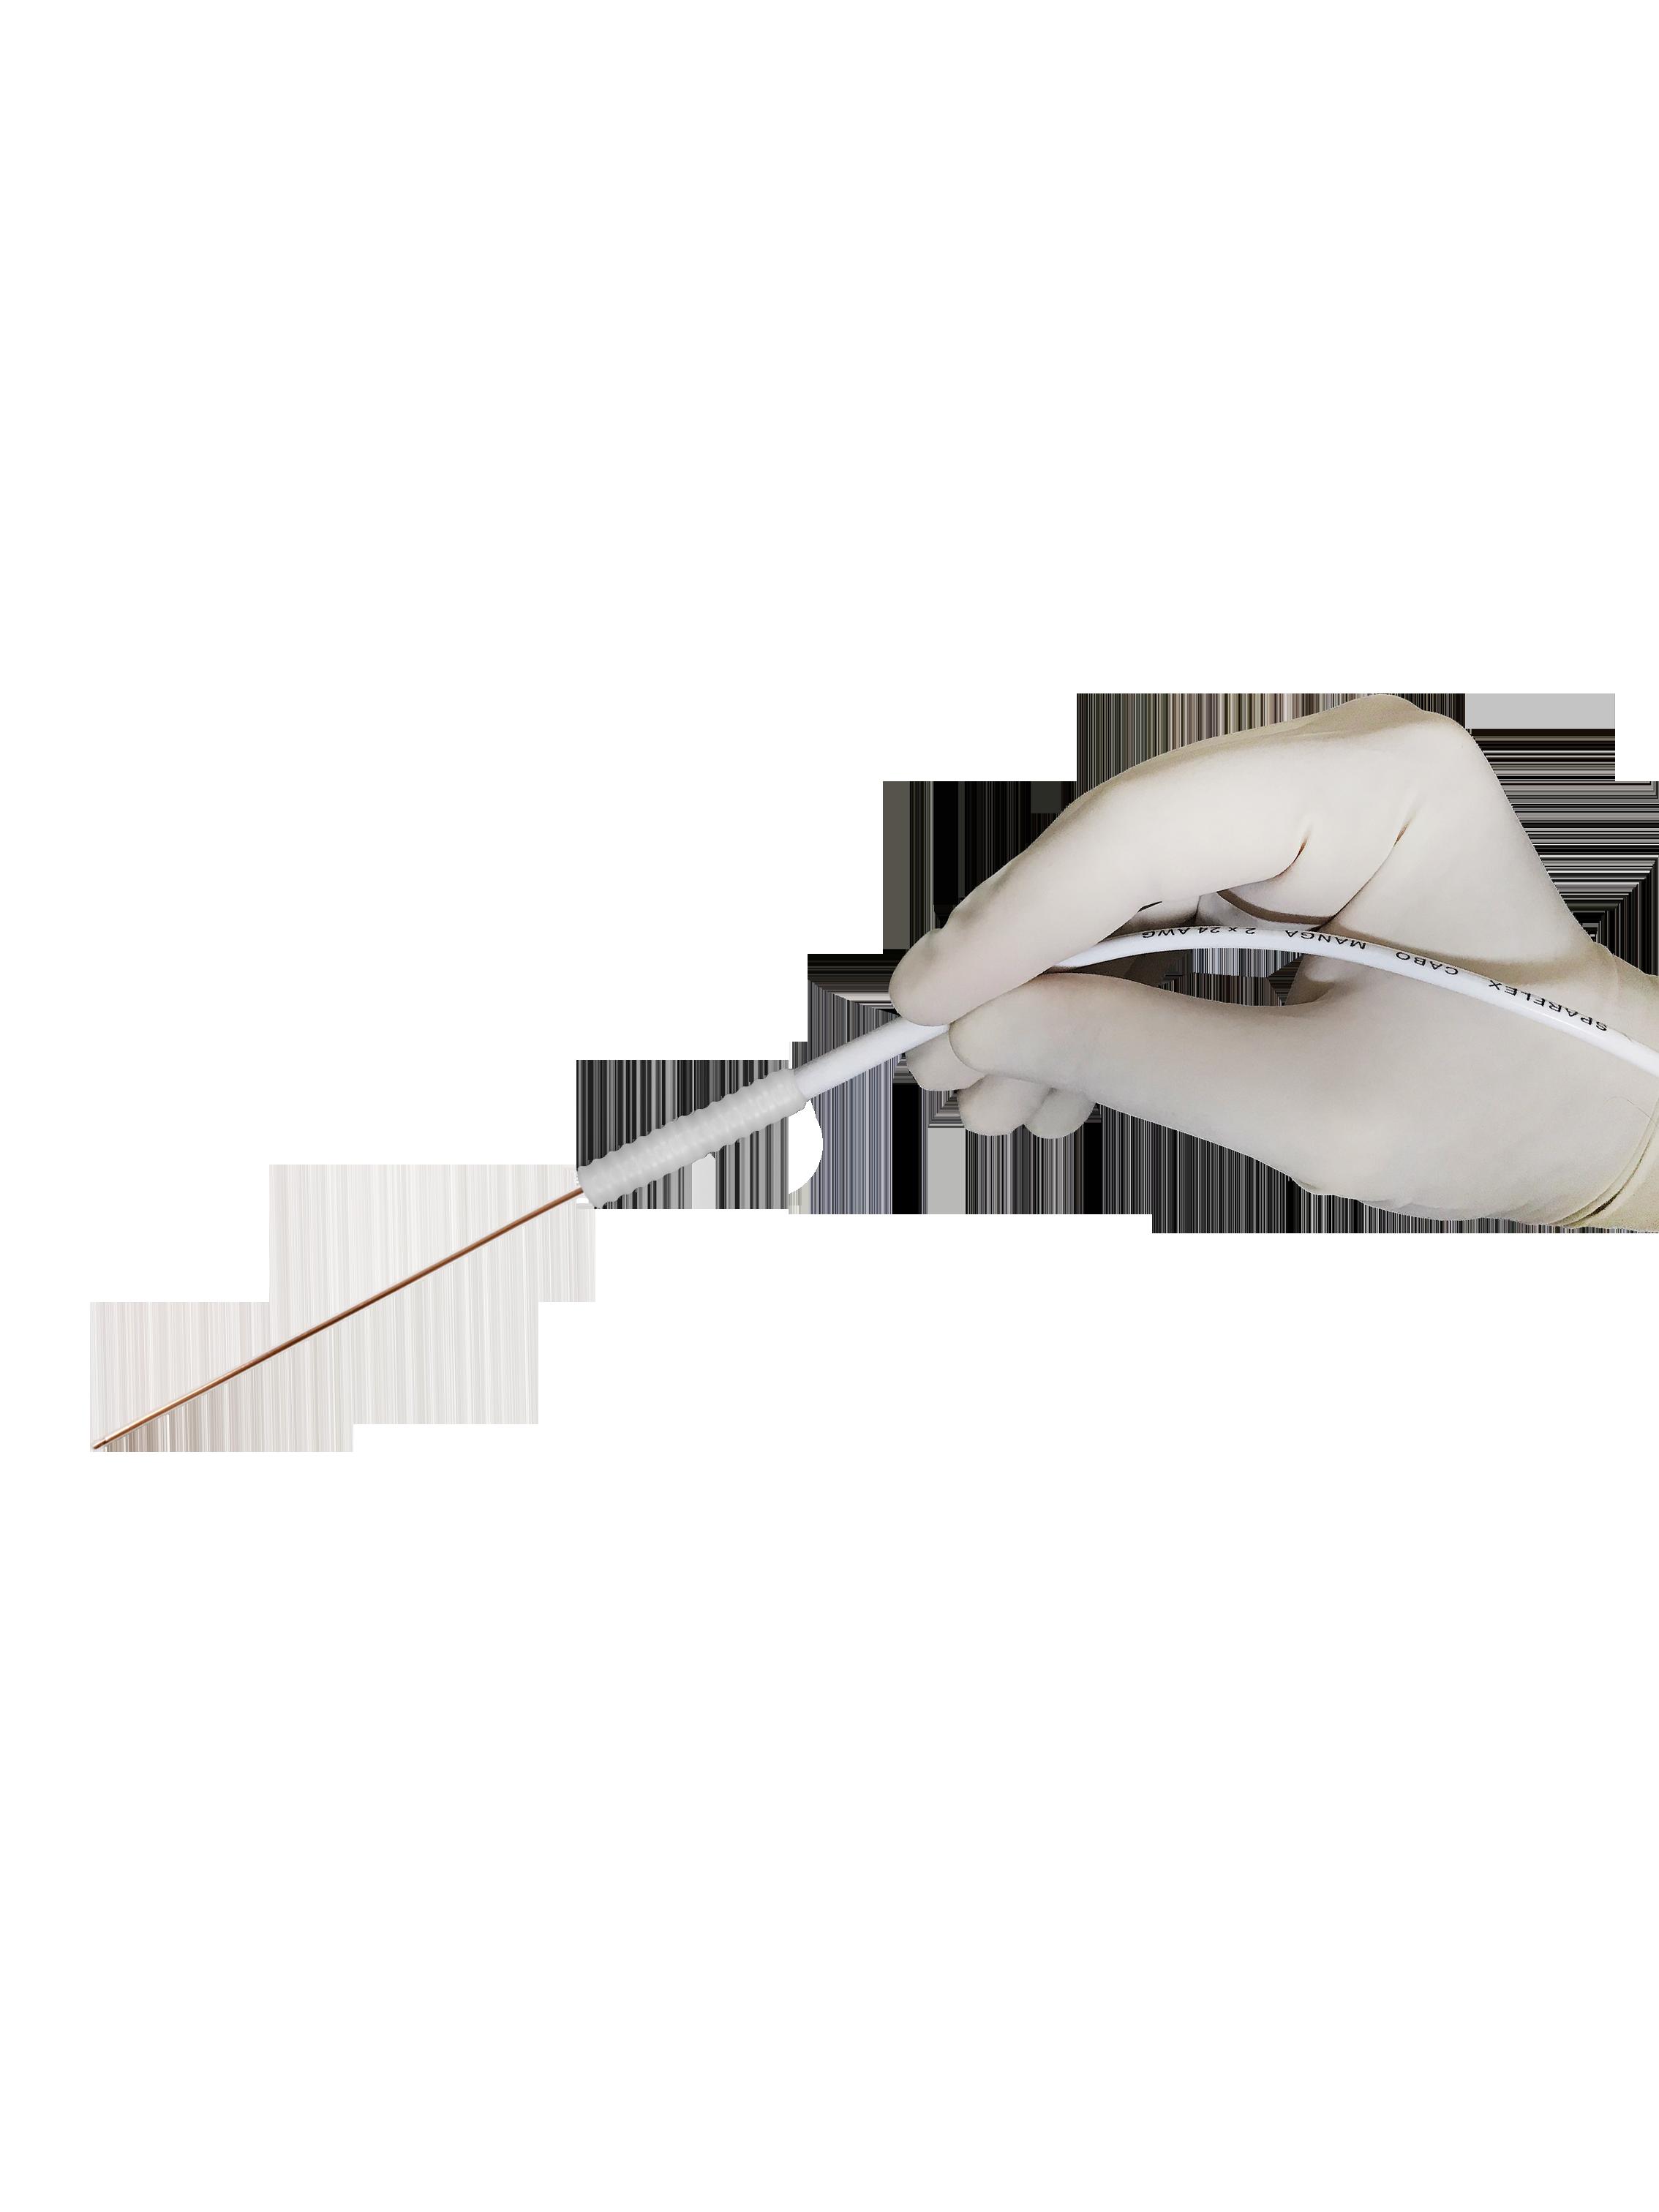 ACEL1507 - Eletrodo Eletrocirúgico Dacrio, Reto